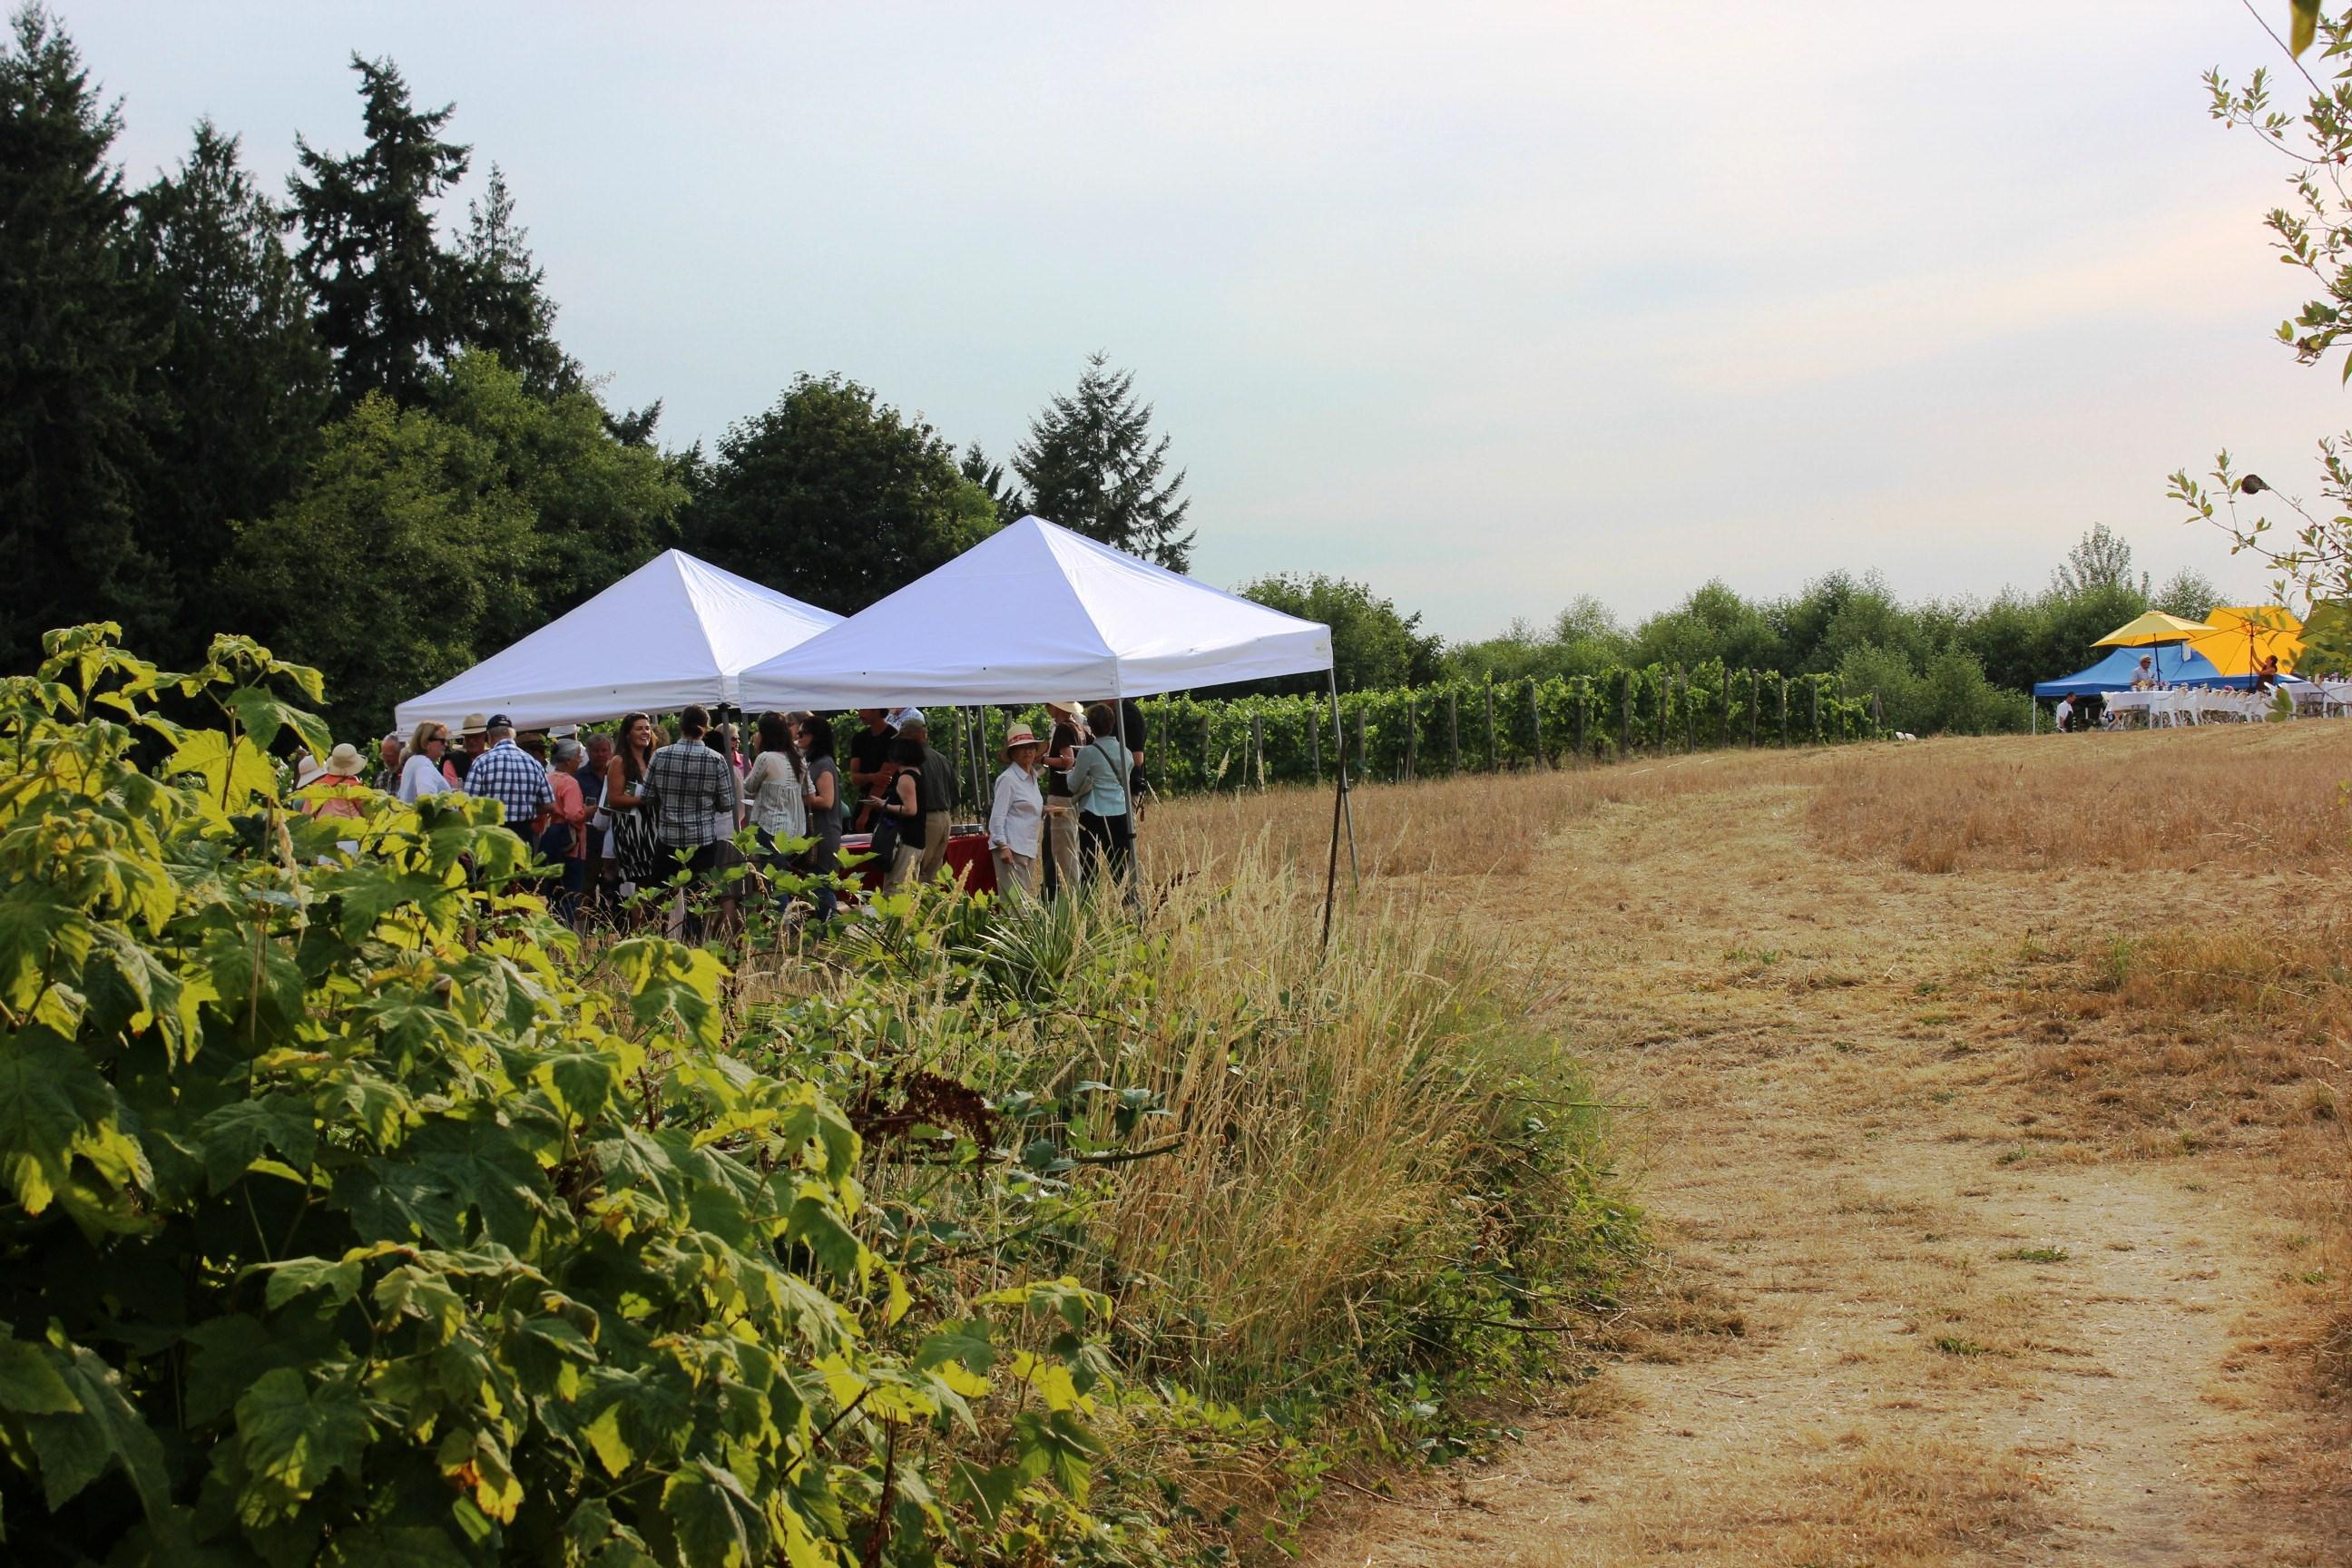 Near the Vineyard